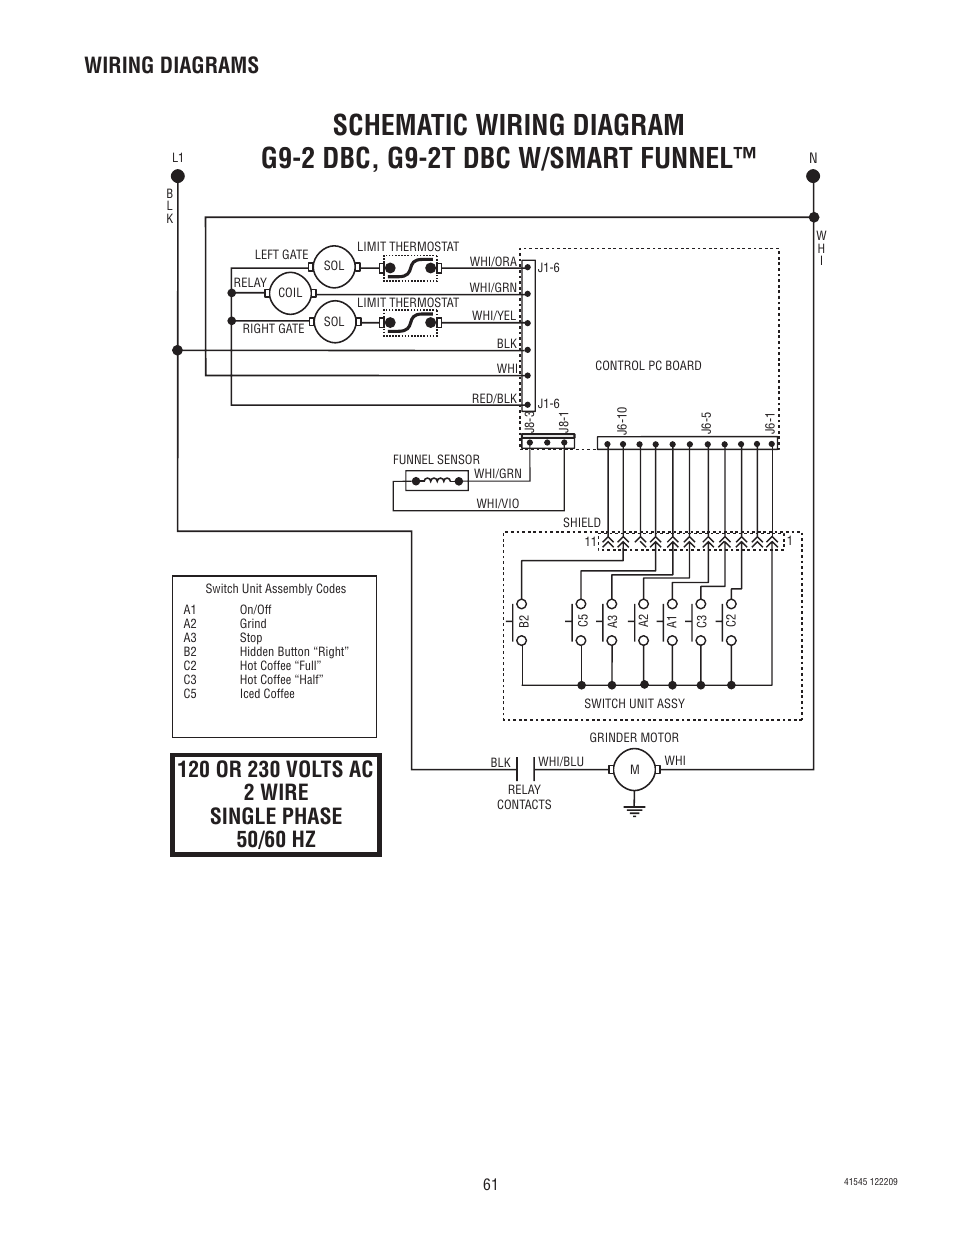 hight resolution of wiring diagrams bunn g9 2t dbc user manual page 61 79 rh manualsdir com bunn coffee